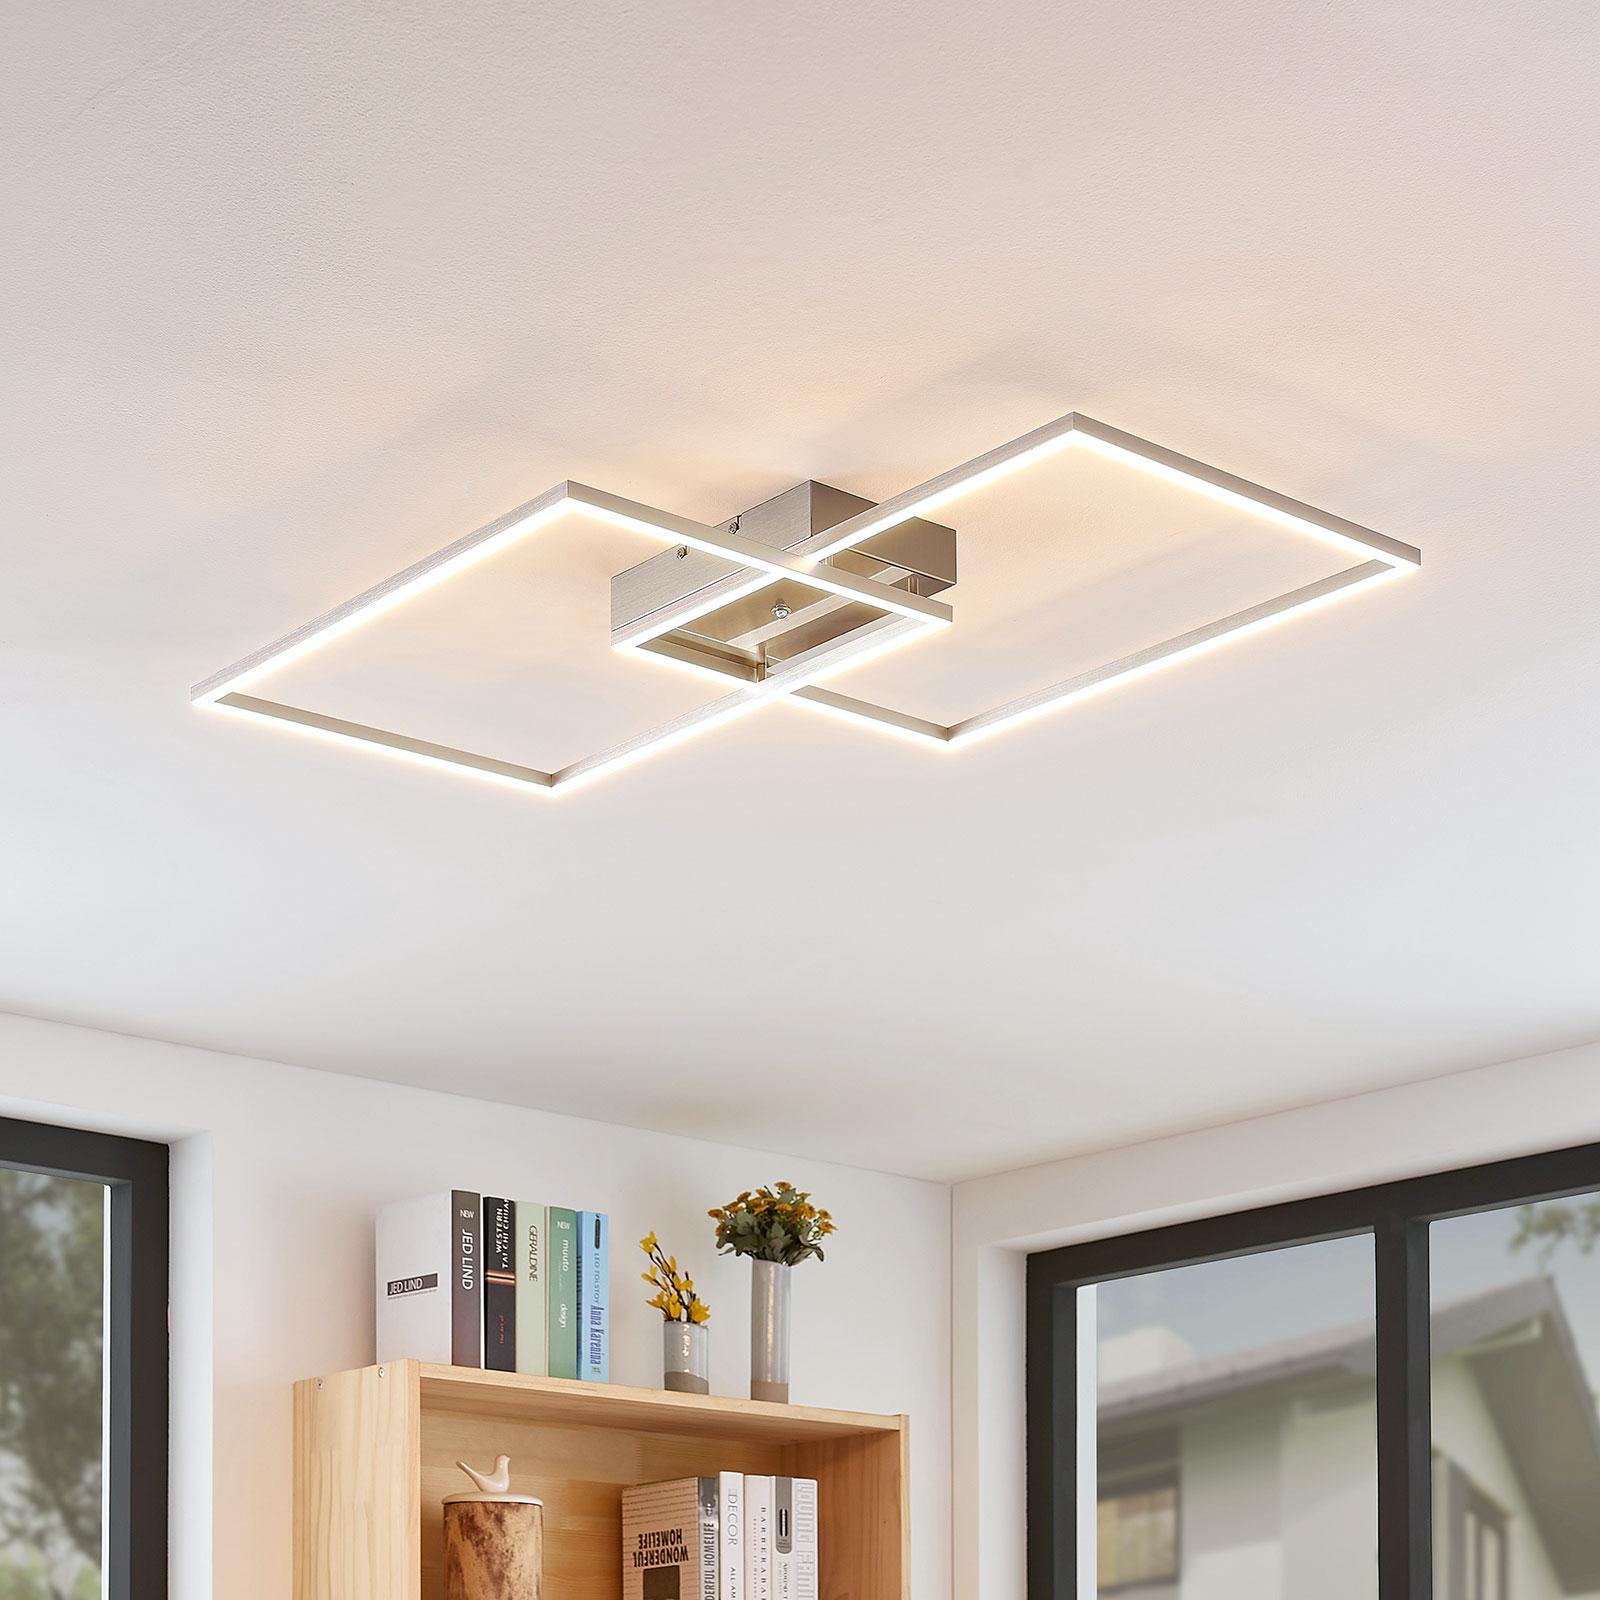 LED-Deckenleuchte Quadra, dimmbar, 2-flg., 75 cm